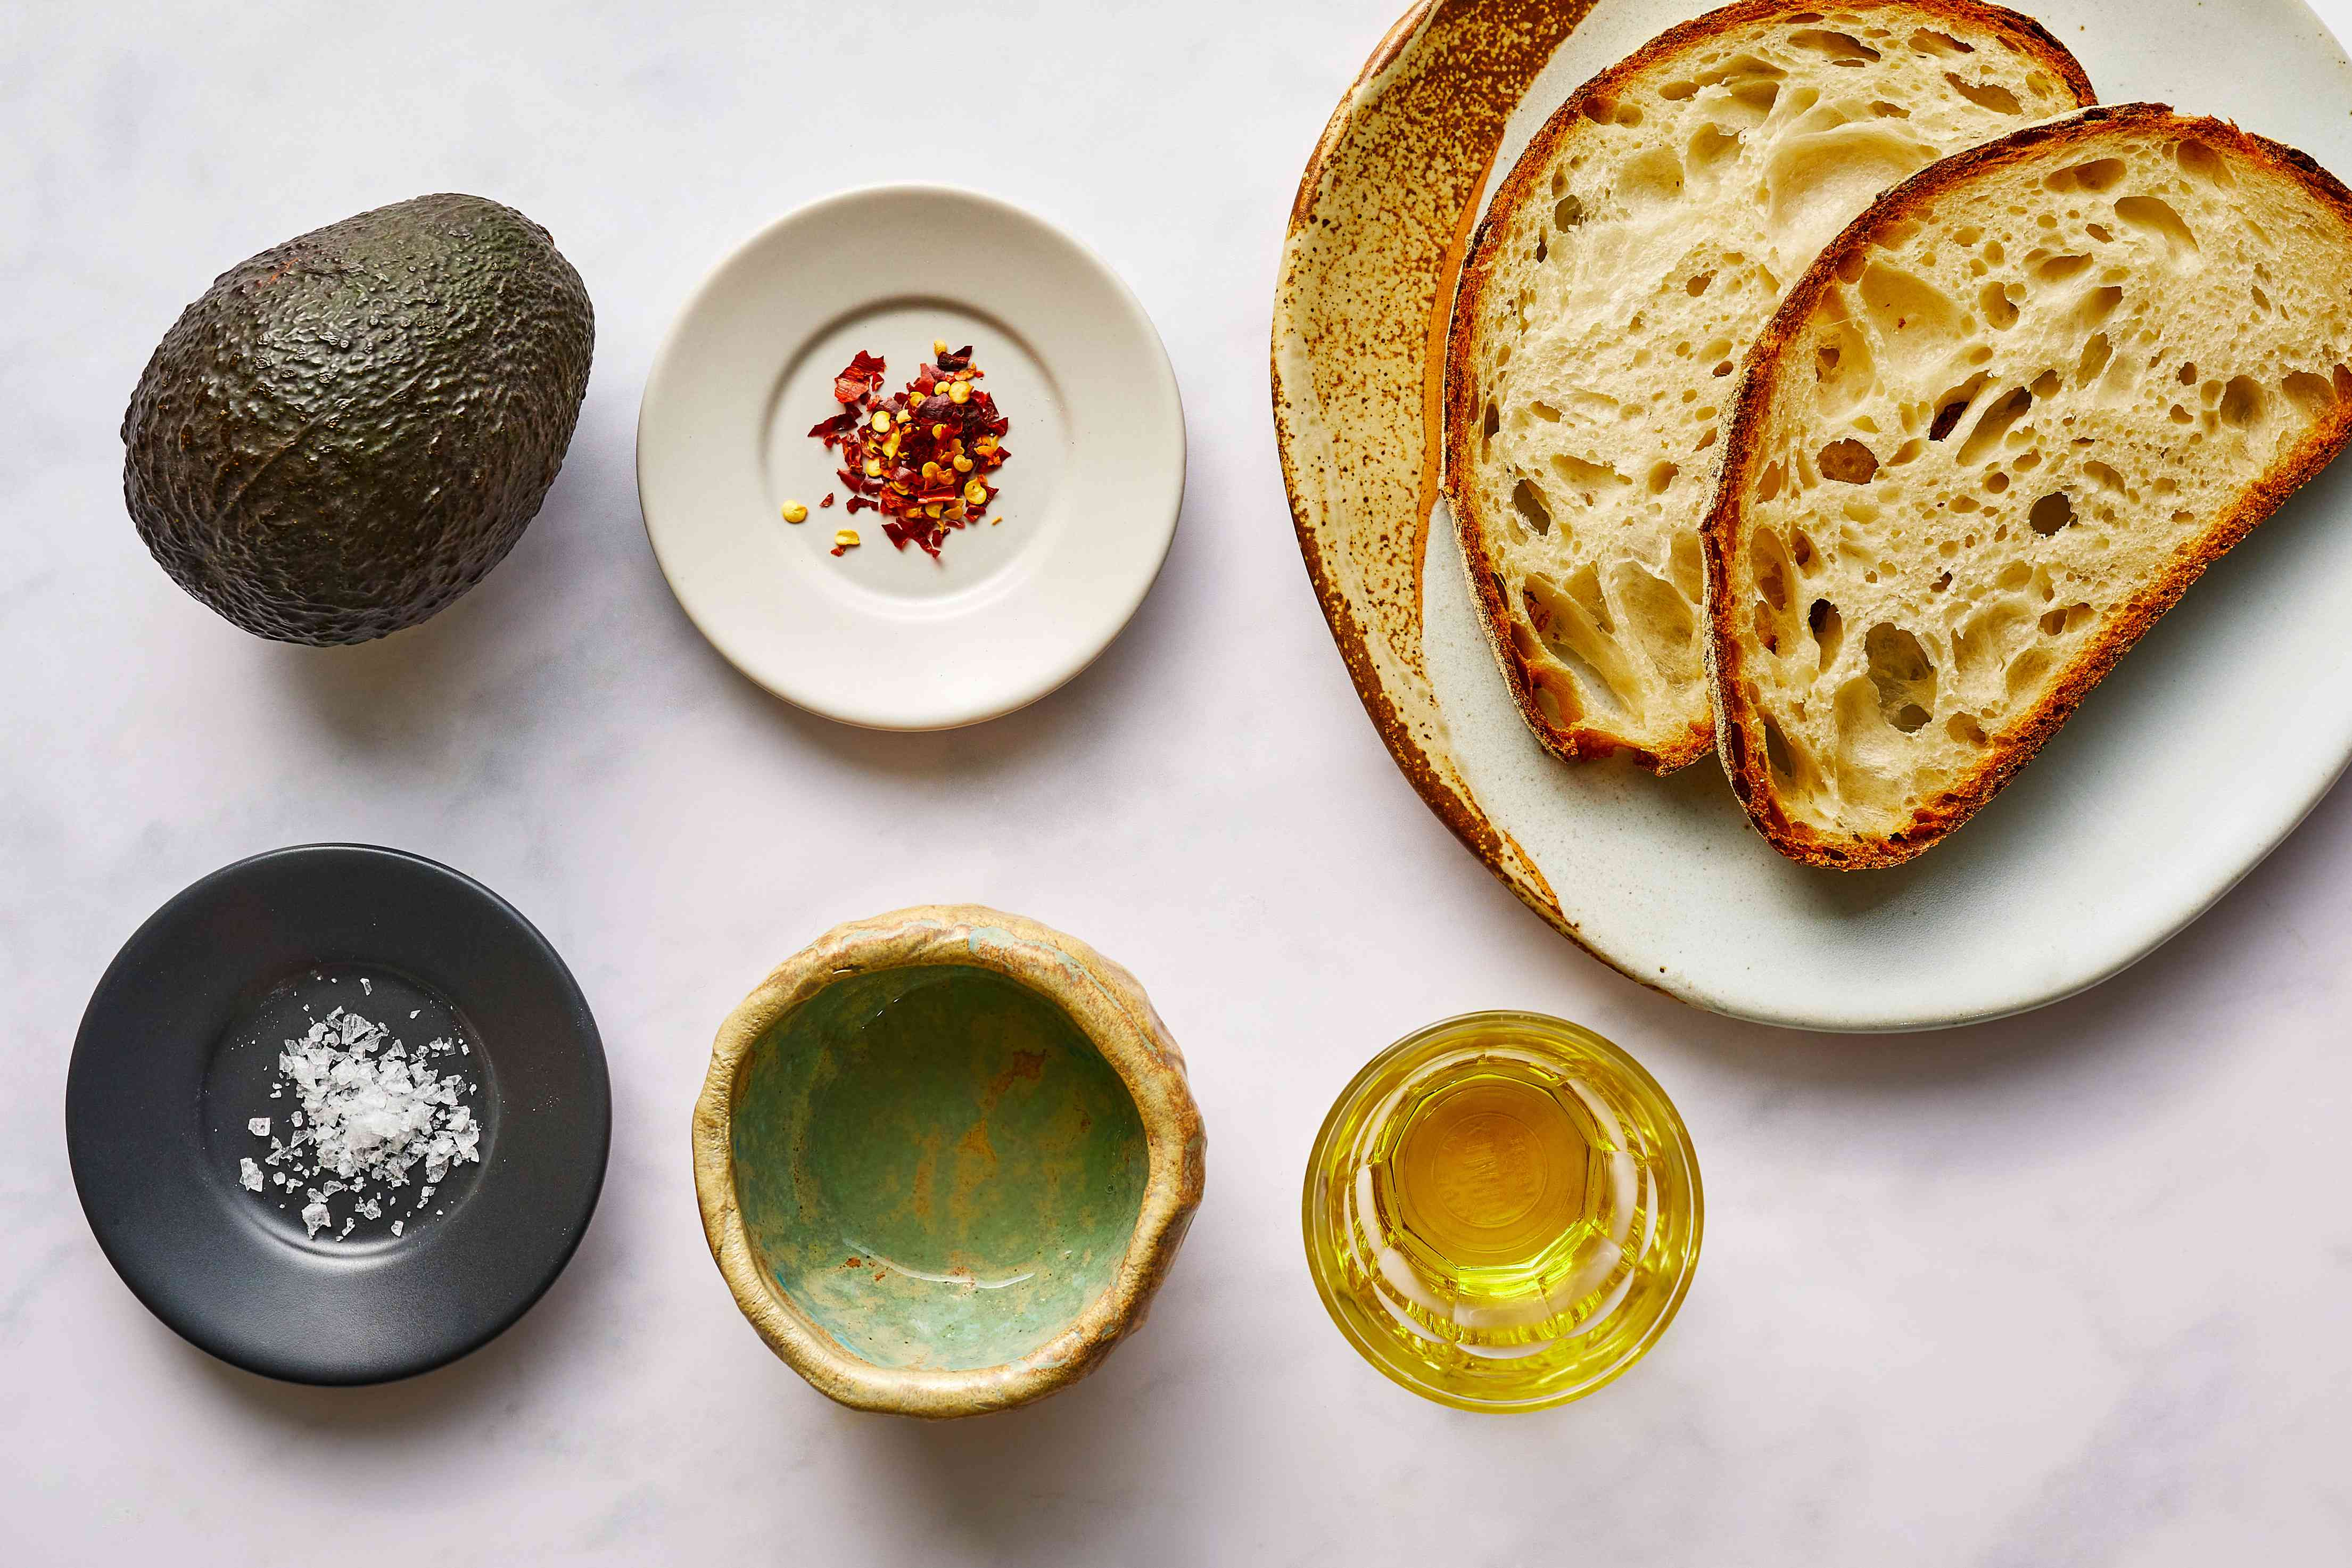 ingredients for avocado toast